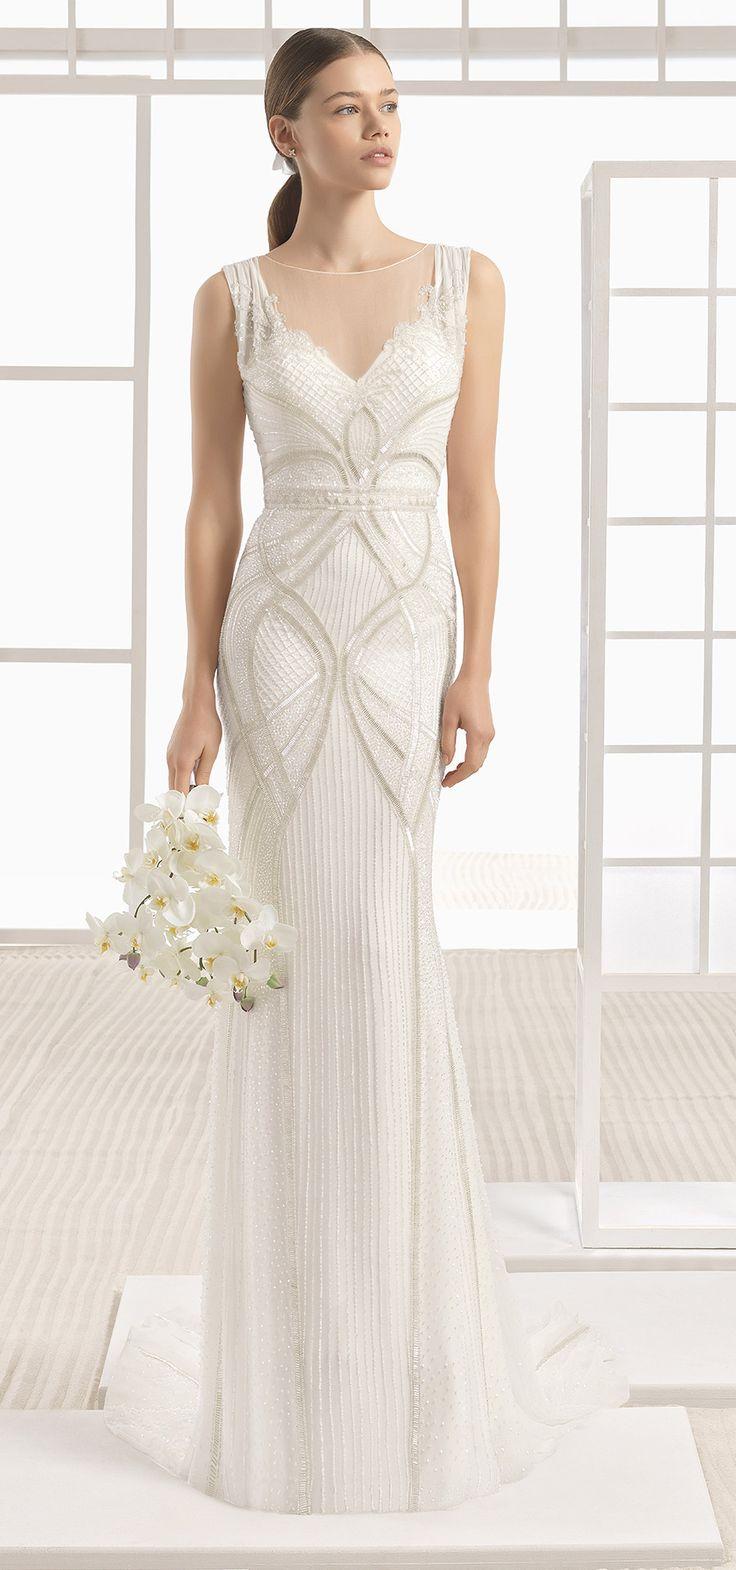 Art Deco 2017 @rosaclara Soft collection. A glamorous column wedding dress with lavish Art Deco style beading.